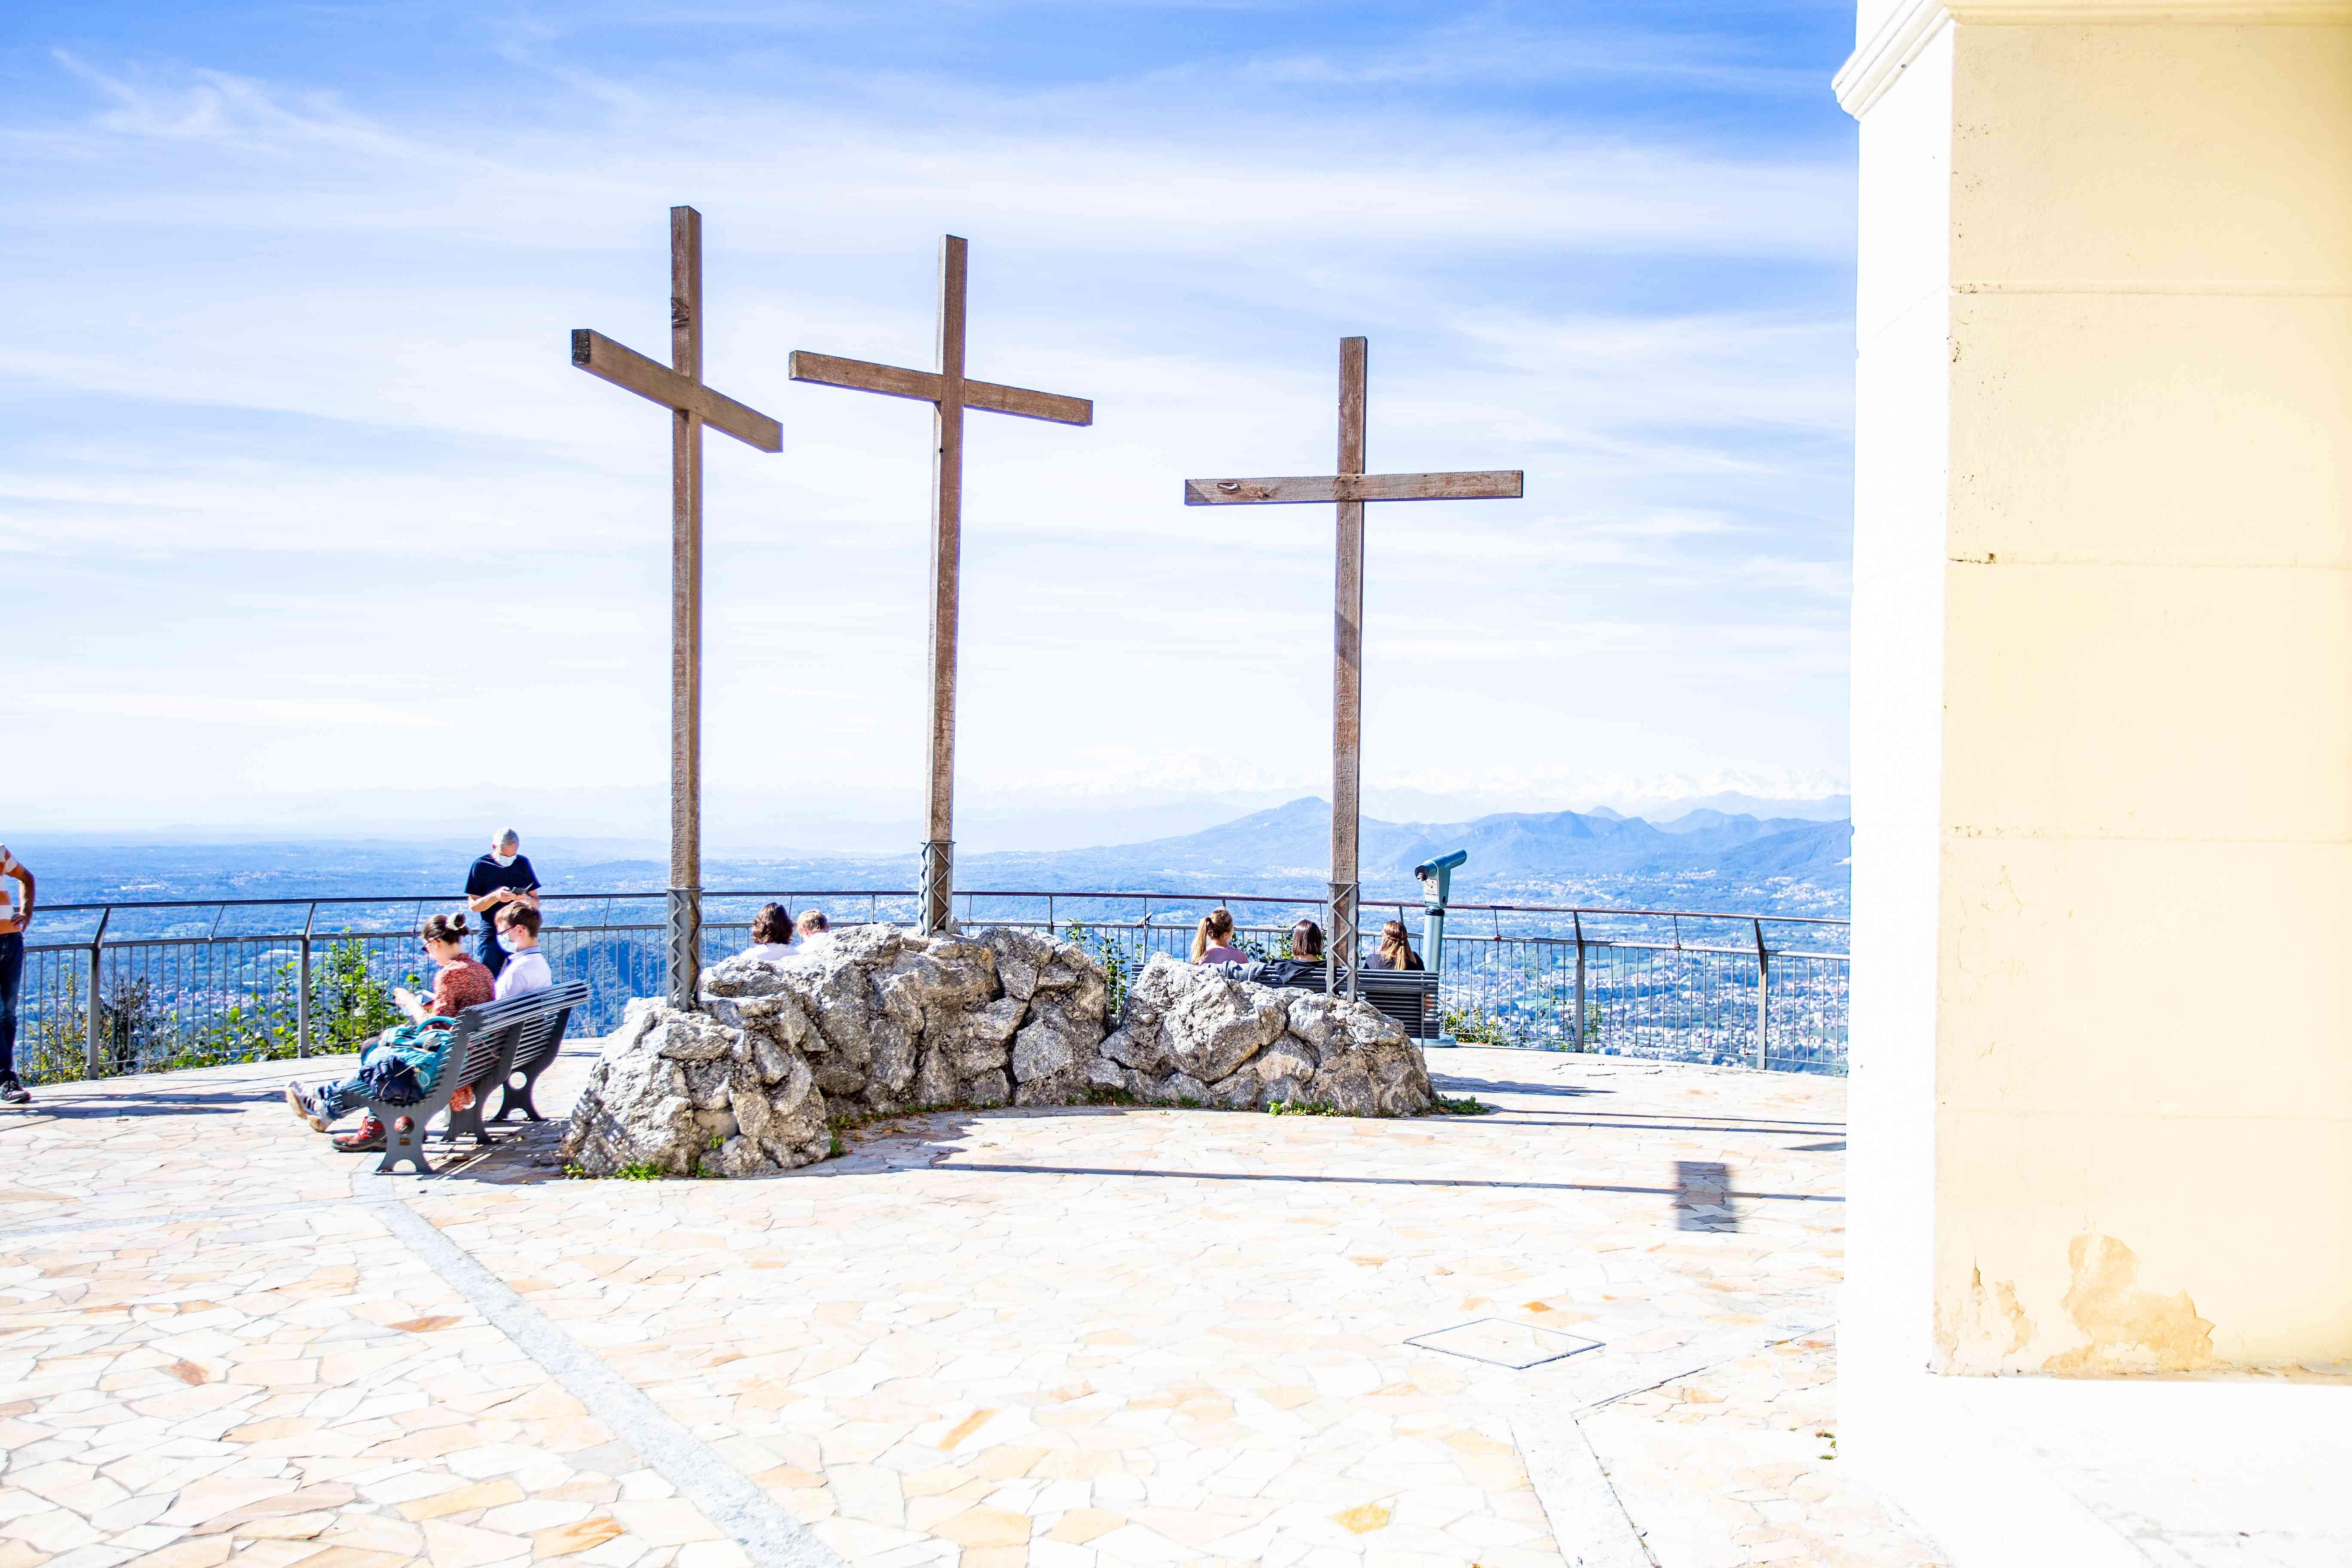 Faro Voltiano, Lake Como, Italy